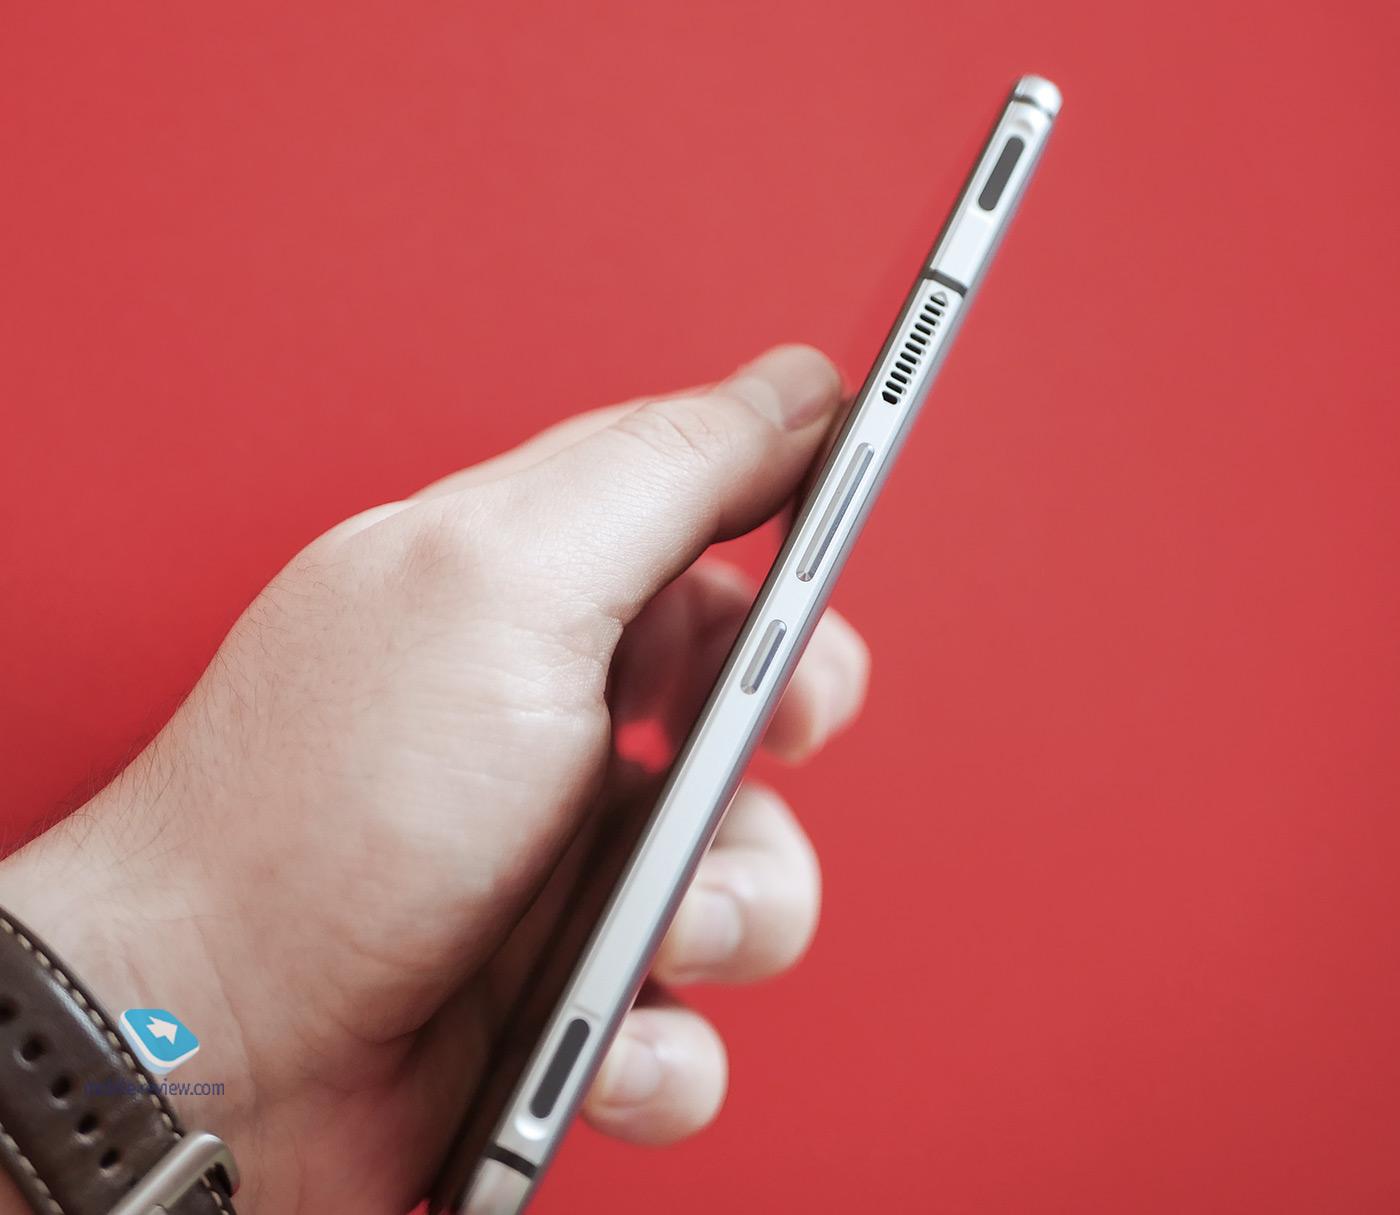 Обзор игрового смартфона RedMagic 5S от ZTE – точно не проиграешь!